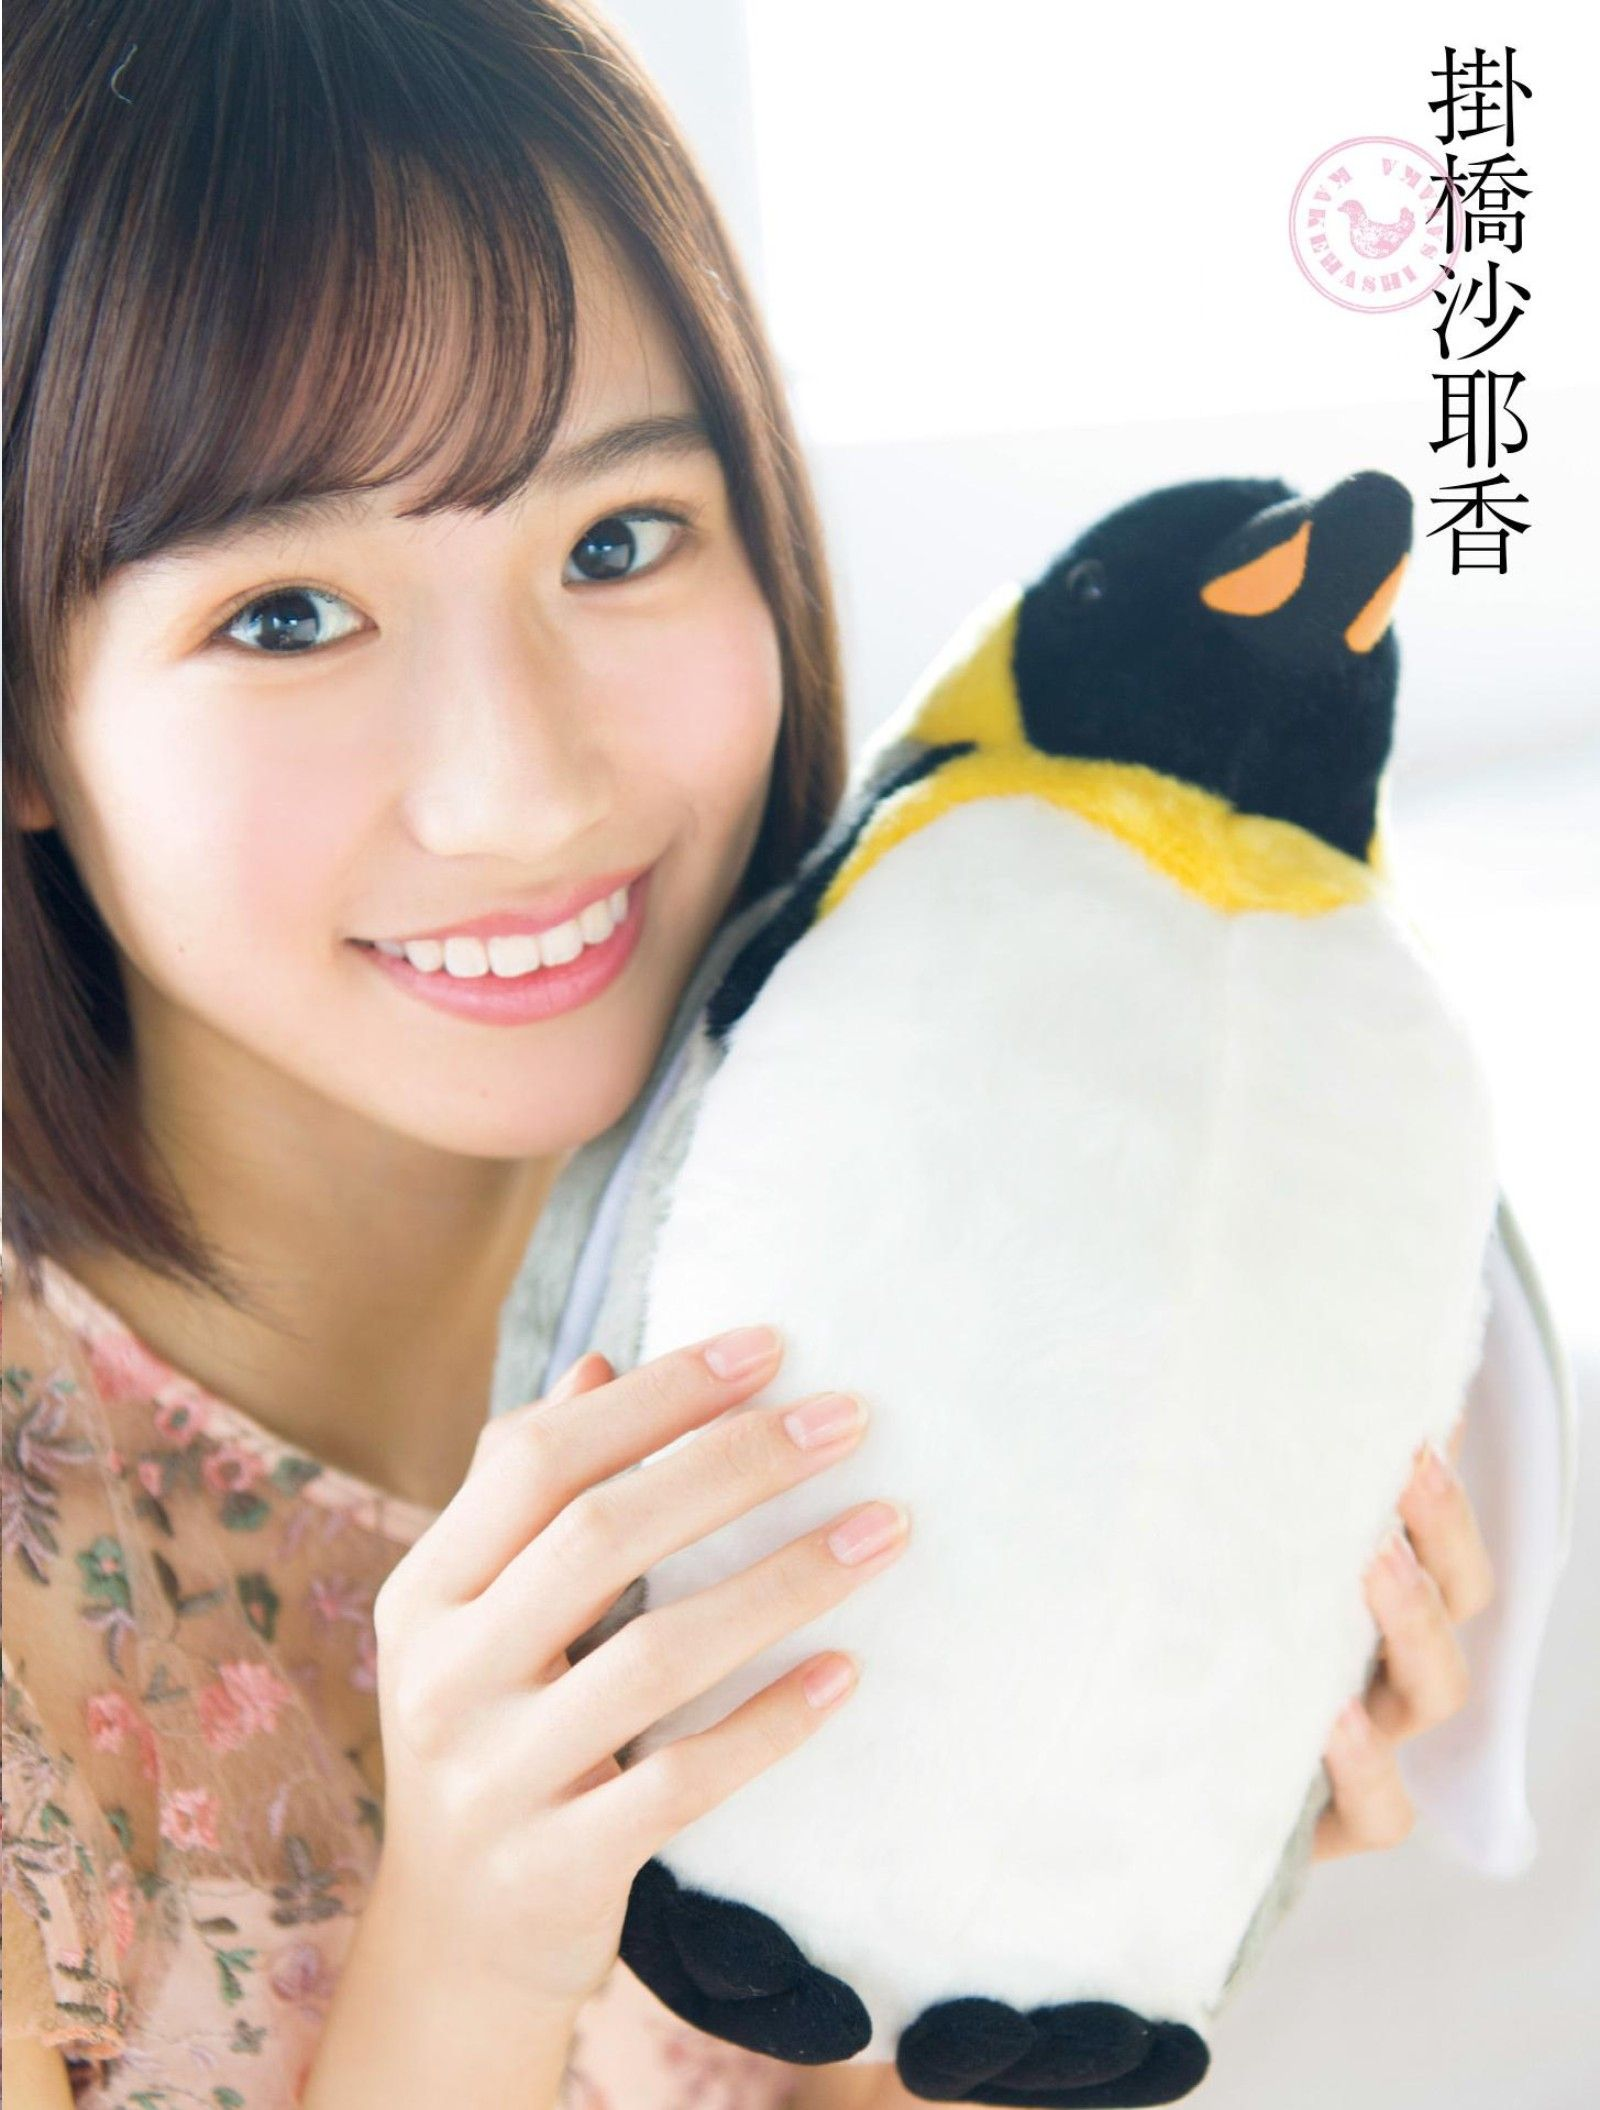 Nogizaka おしゃれまとめの人気アイデア Pinterest Andaruza 香 かわいい 乃木坂 4期生